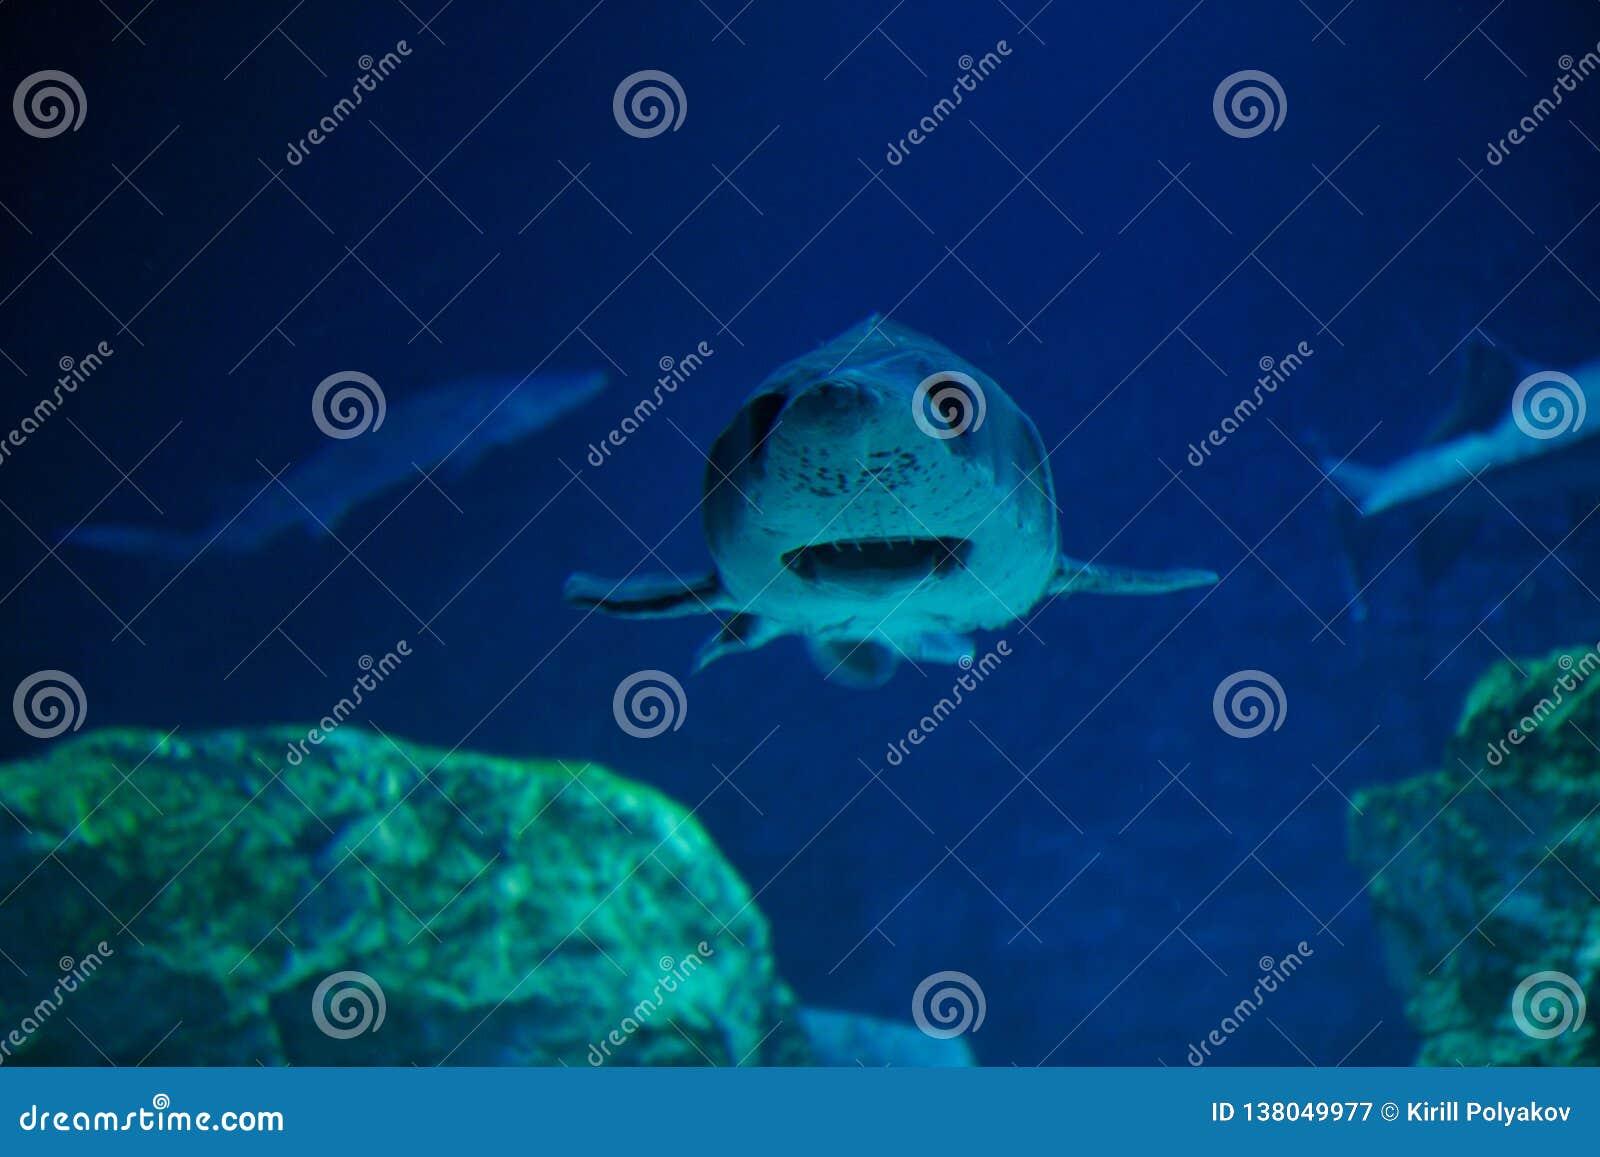 Portrait of a shark in the aquarium.